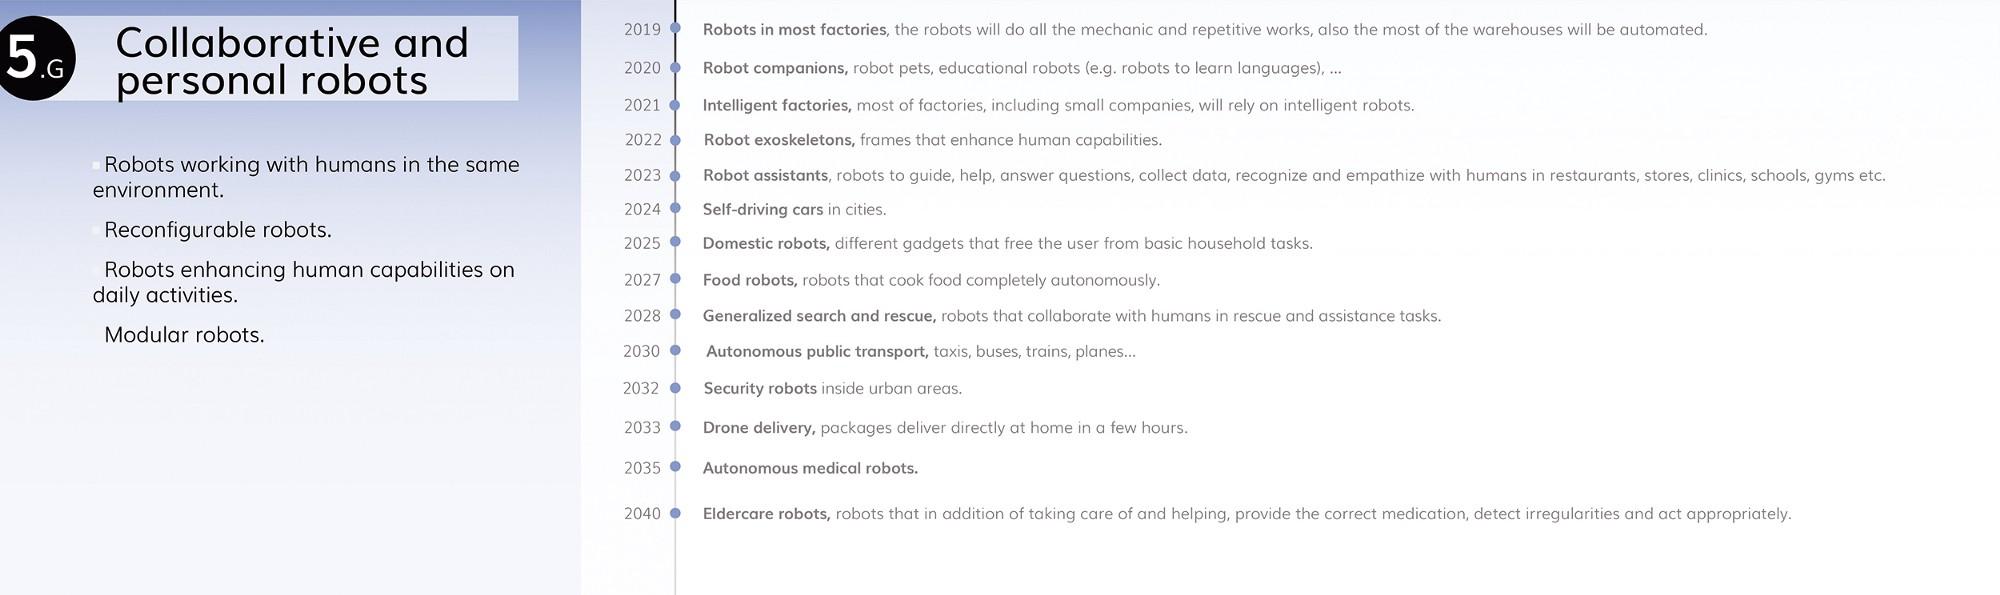 Envisioning the future of robotics | Robohub